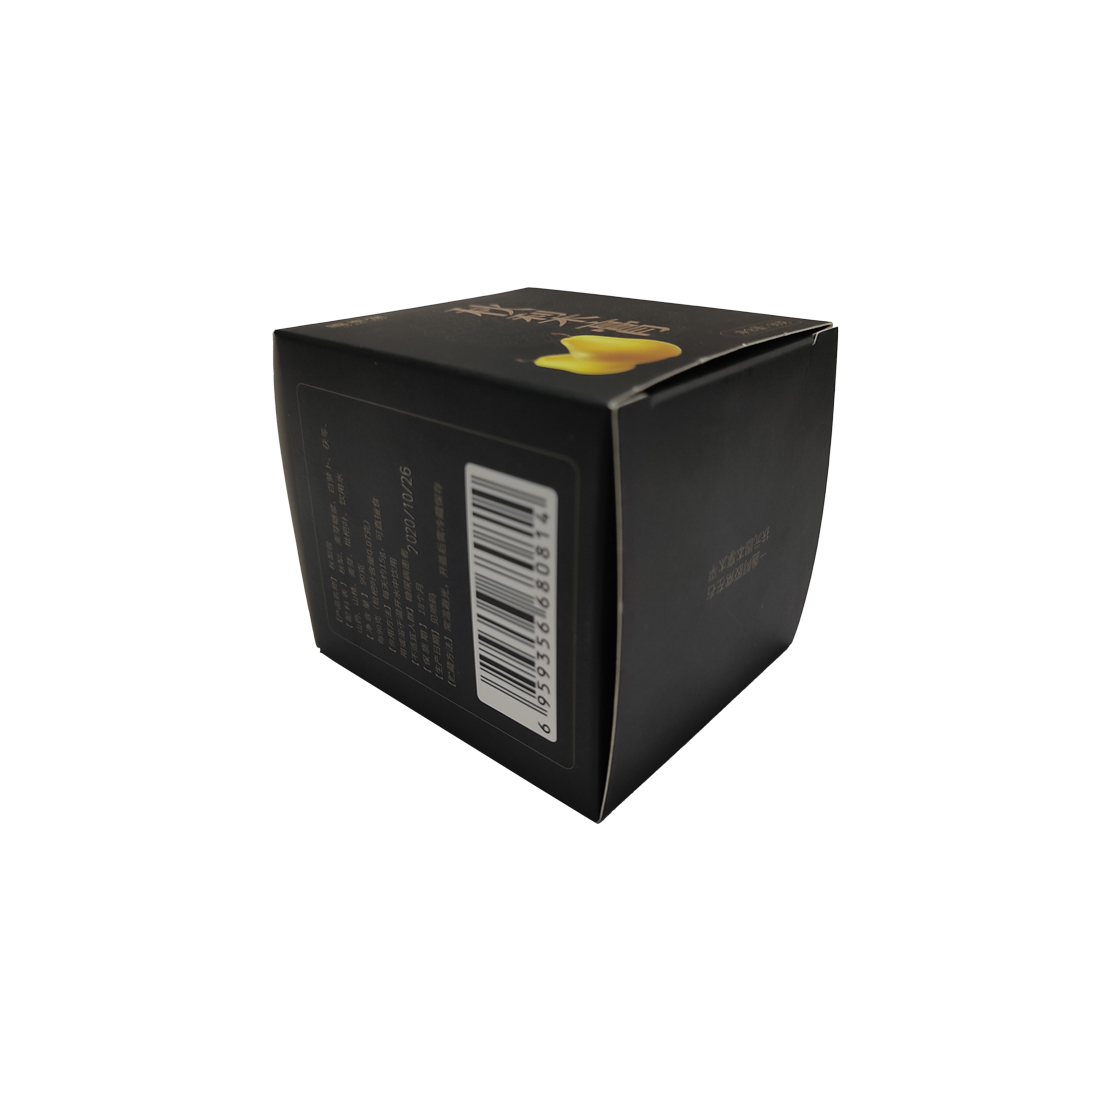 Pembungkusan Kotak Kertas Karton Kosmetik Borong mesra alam OEM